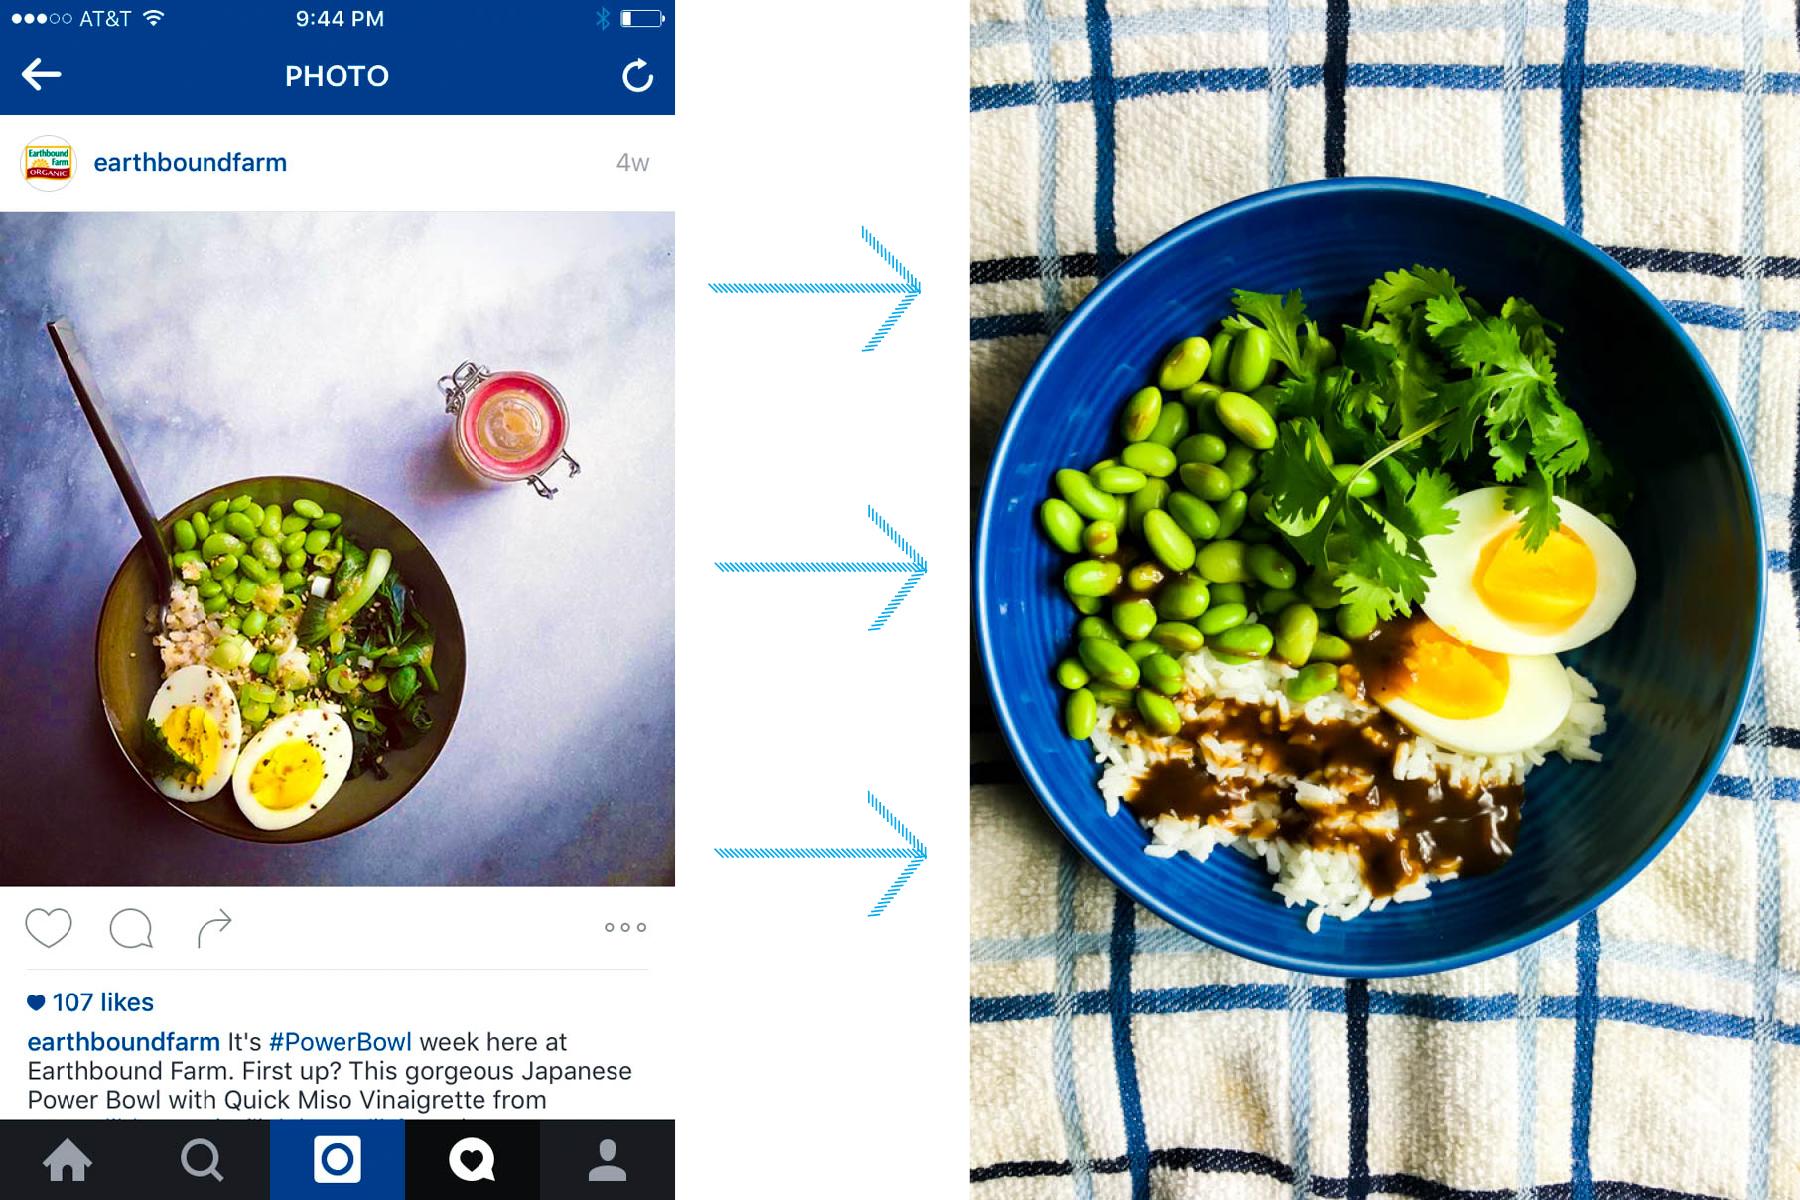 rice + edamame + stirfry sauce + cilantro | immaEATthat.com